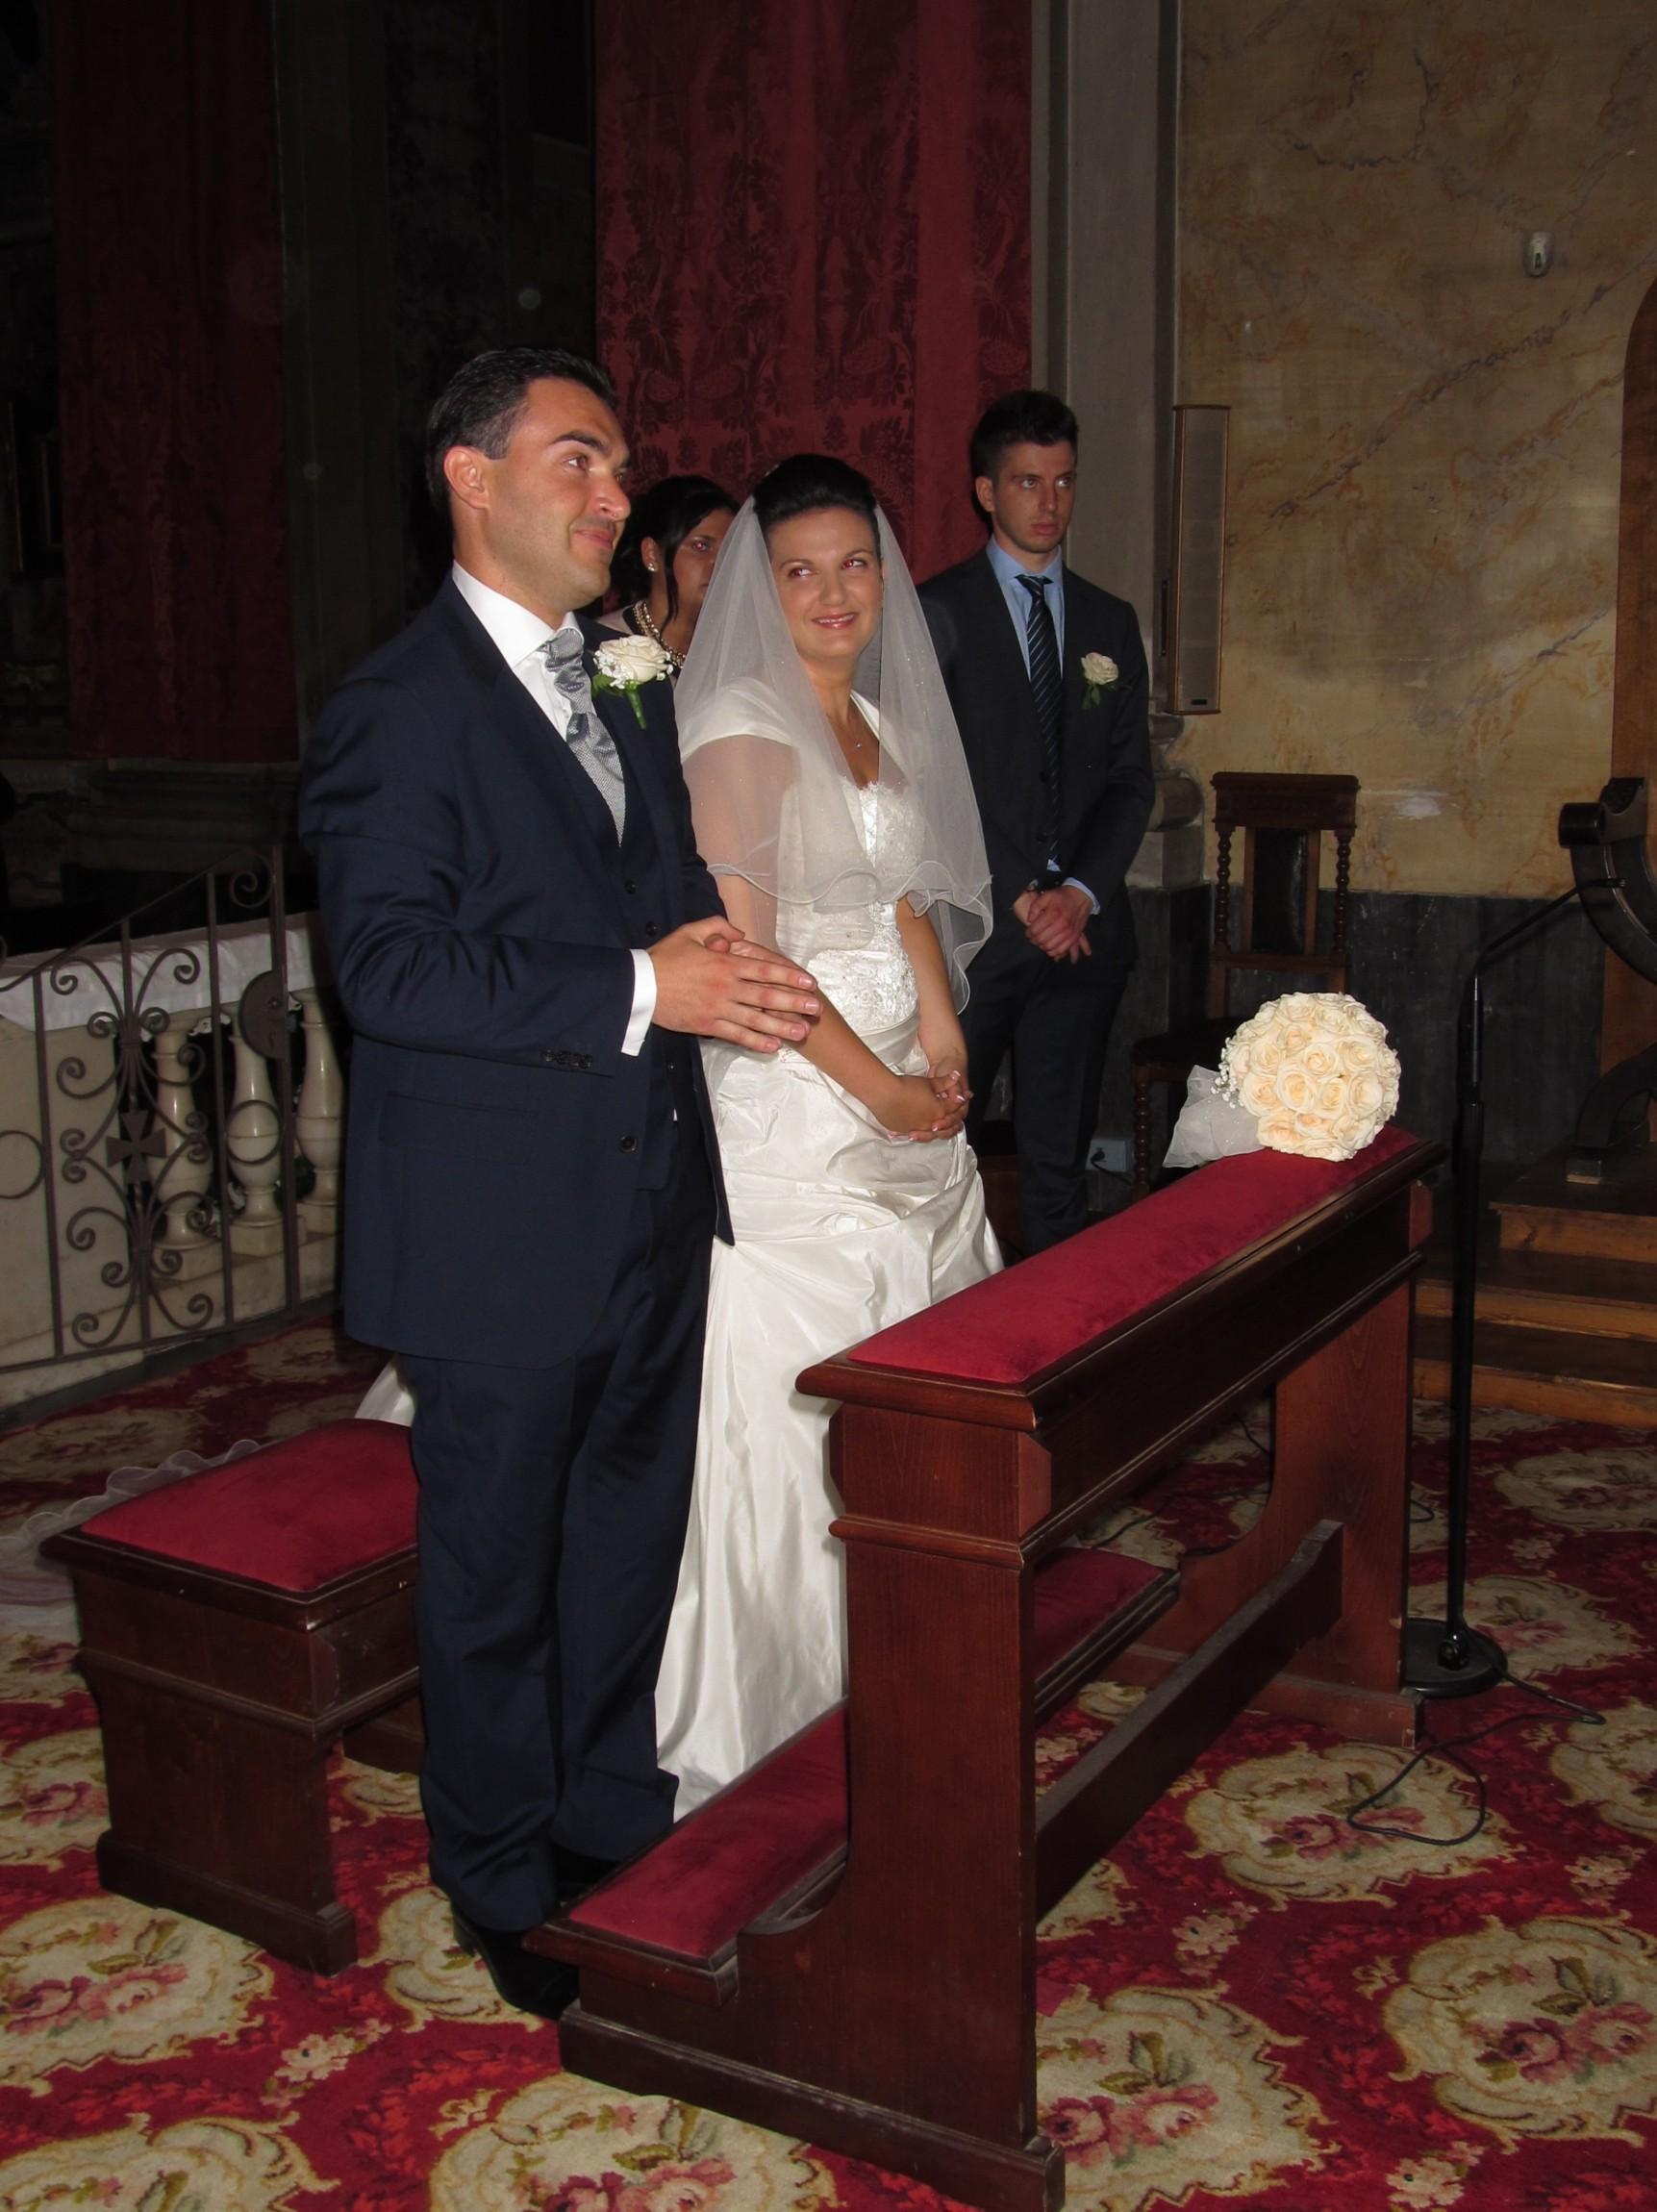 matrimonio_piccardo_franzi_2014-07-19-12-02-57